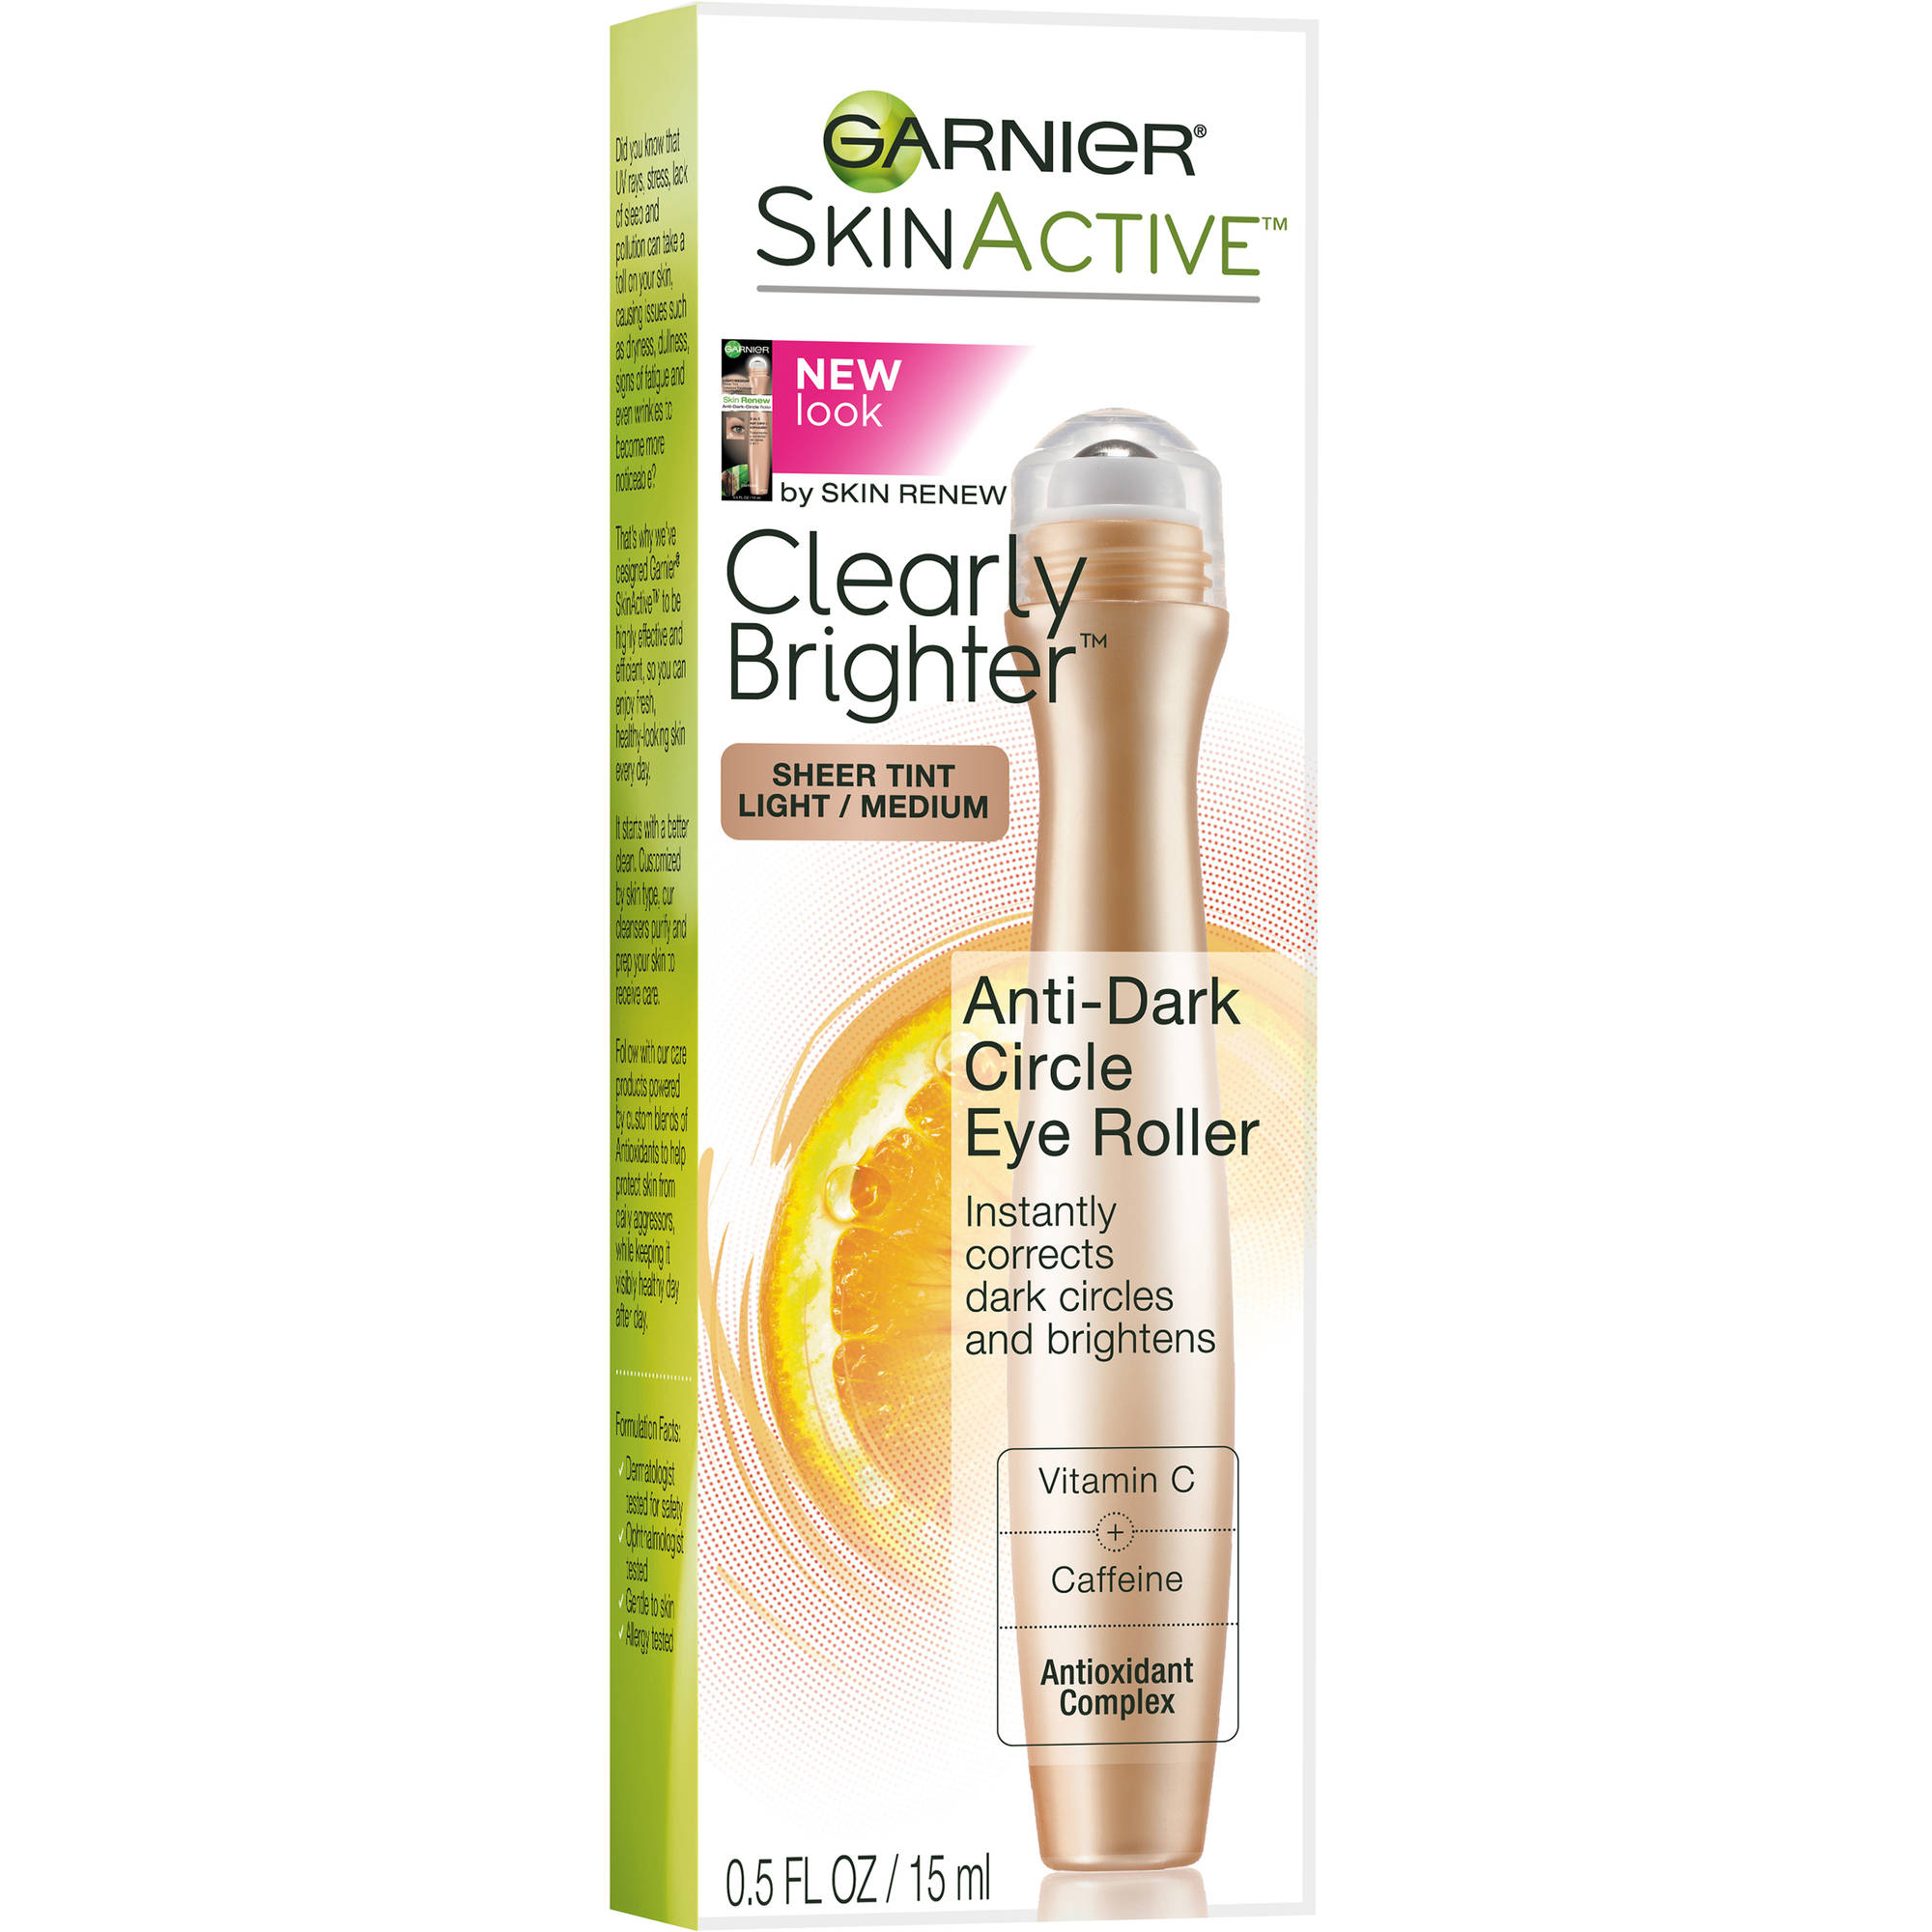 Garnier SkinActive Clearly Brighter Anti-Dark Circle Eye Roller, Light/Medium, 0.5 fl oz